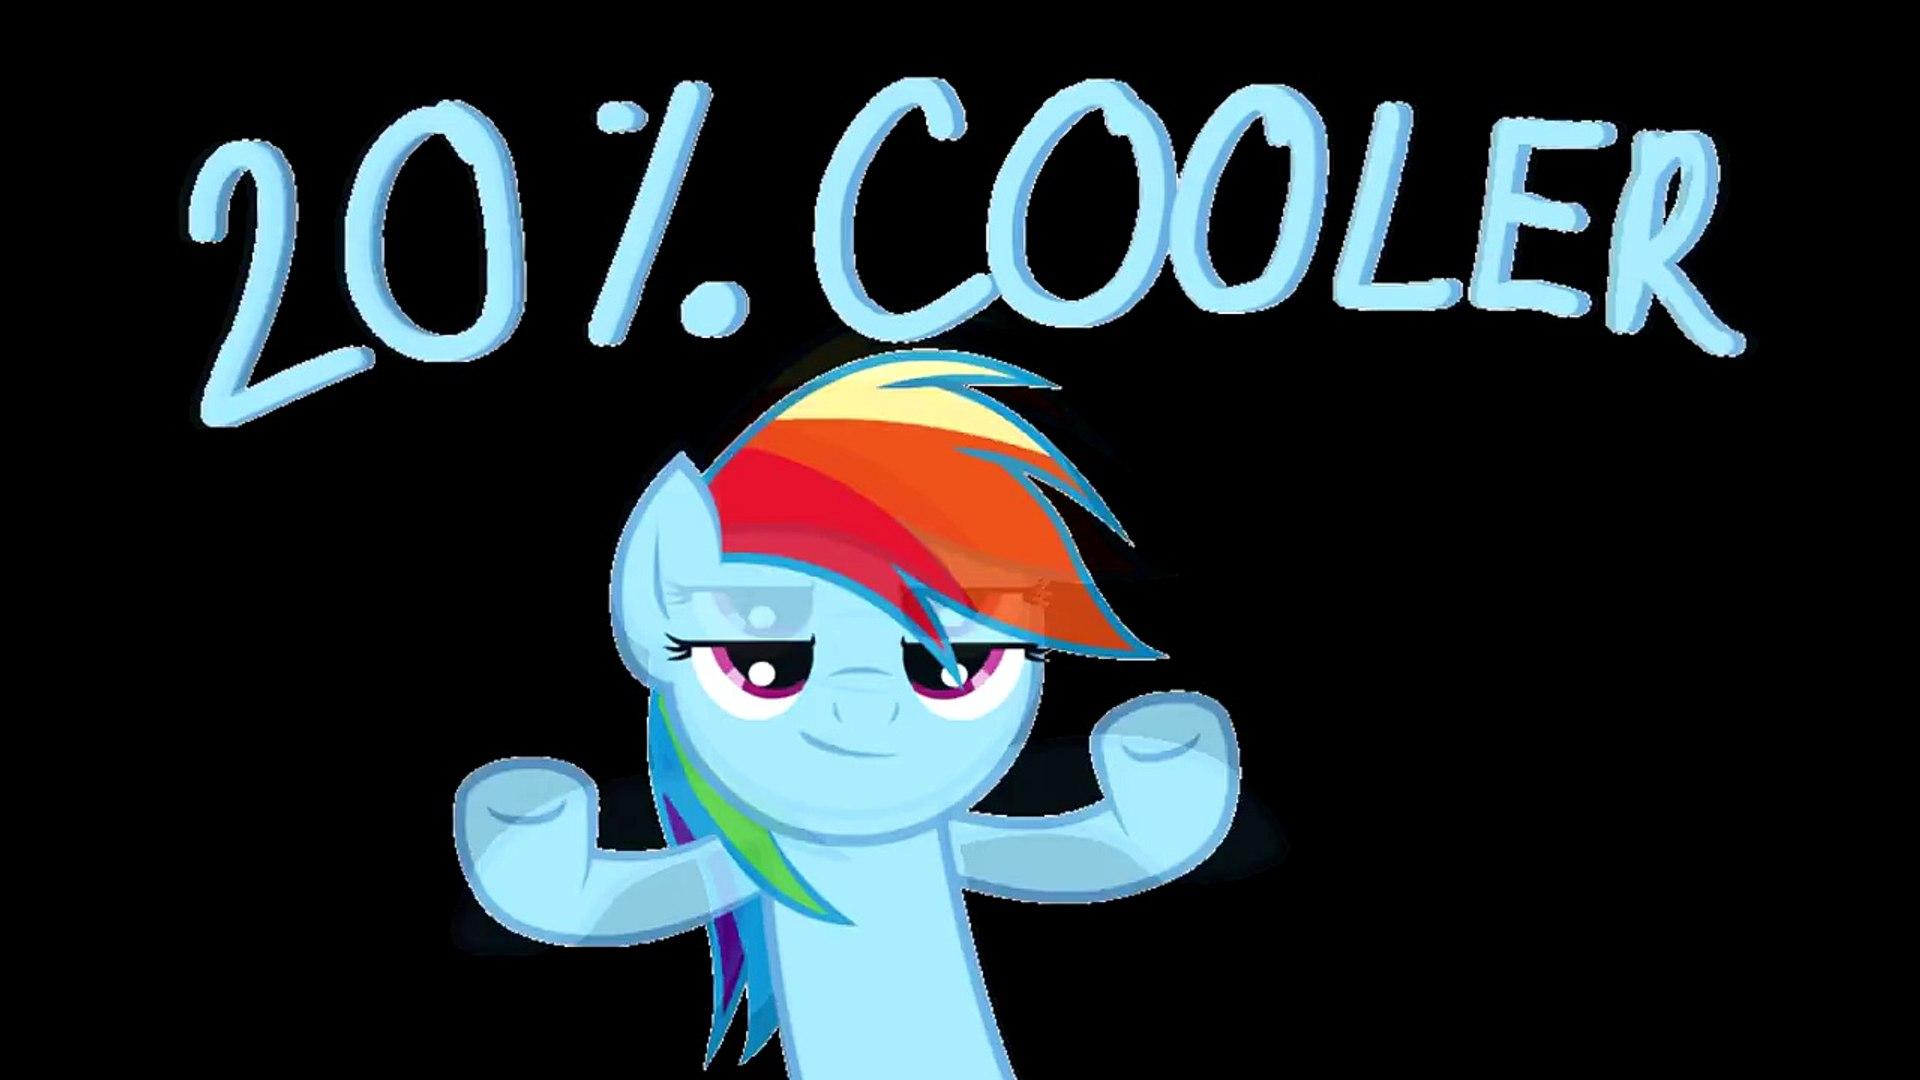 ken ashcorp - 20 percent cooler (alex s. remix)